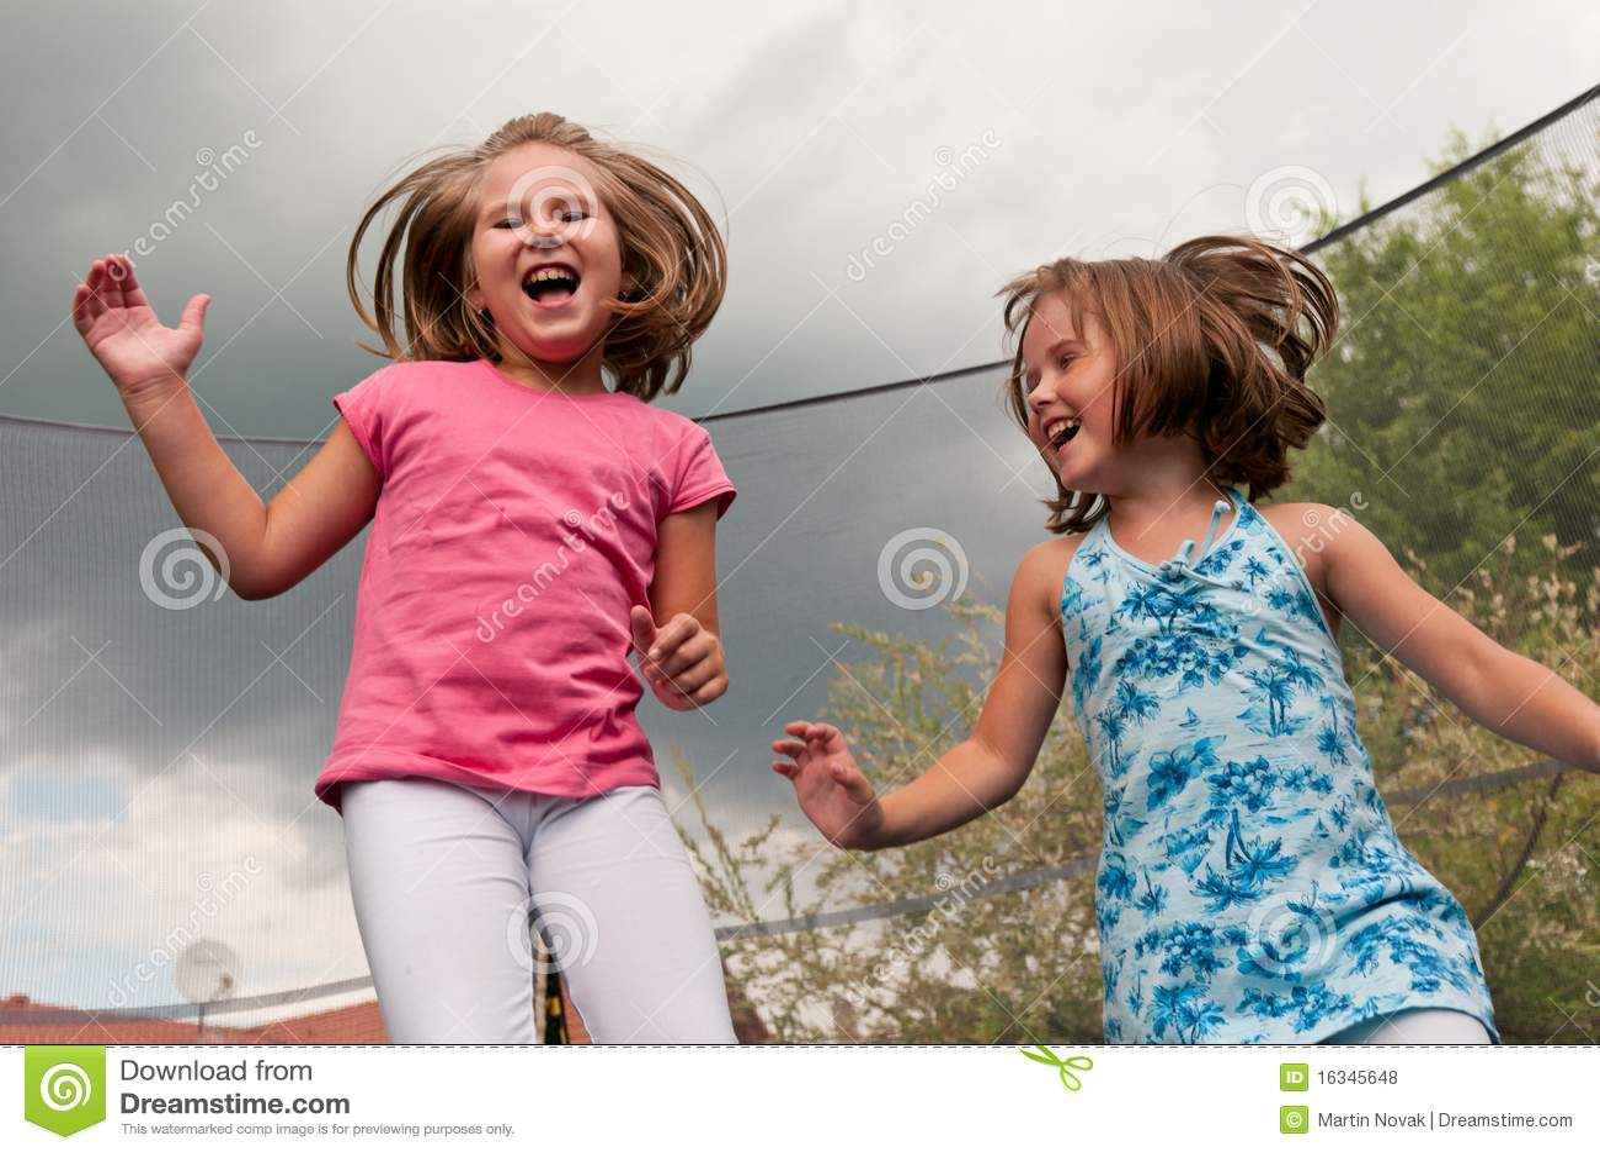 Big fun - childdren jumping